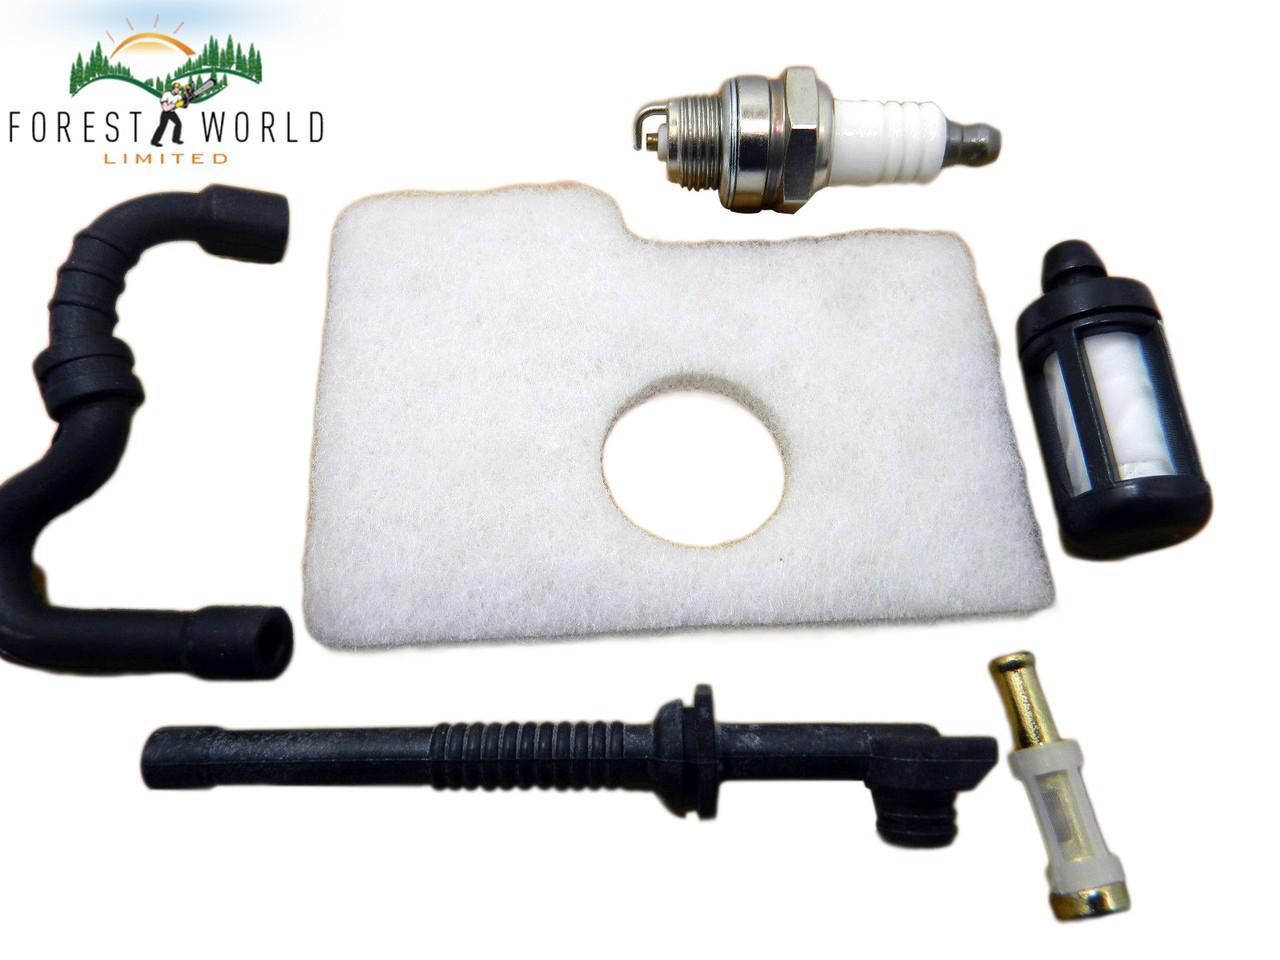 Stihl 017,018,MS 170,MS180 service kit,spark plug , air & fuel filters hose  line